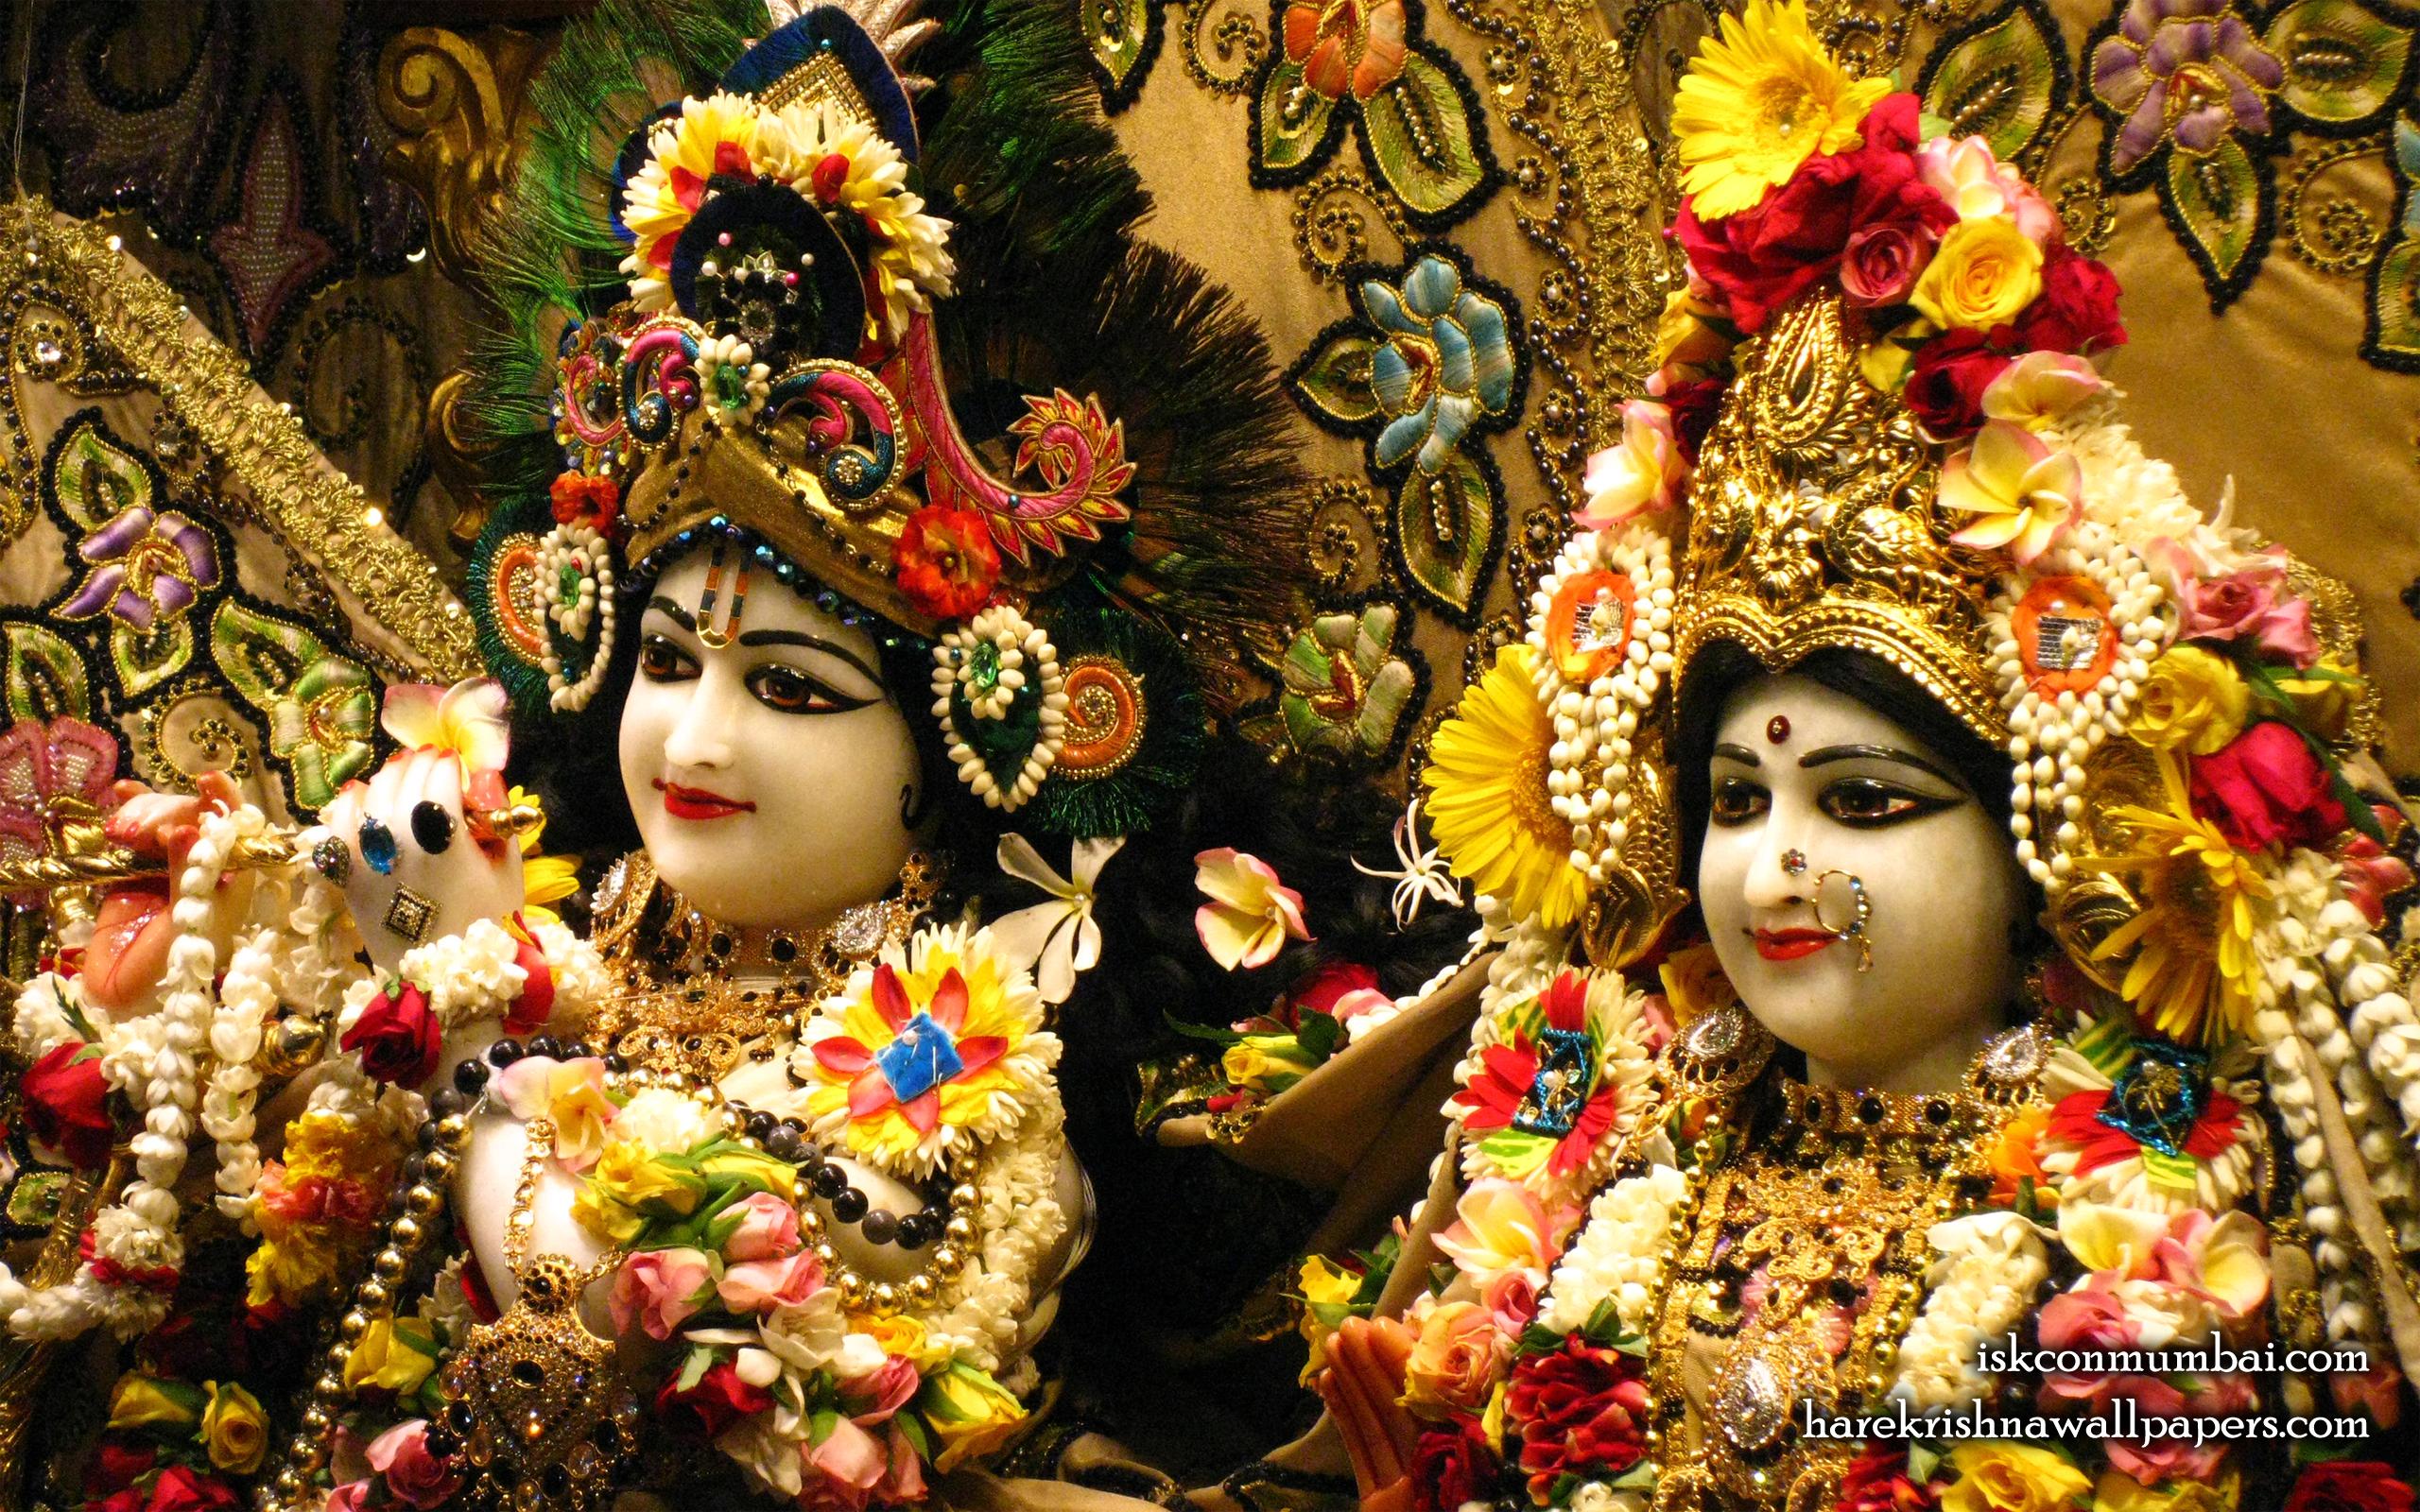 Sri Sri Radha Rasabihari Close up Wallpaper (014) Size 2560x1600 Download